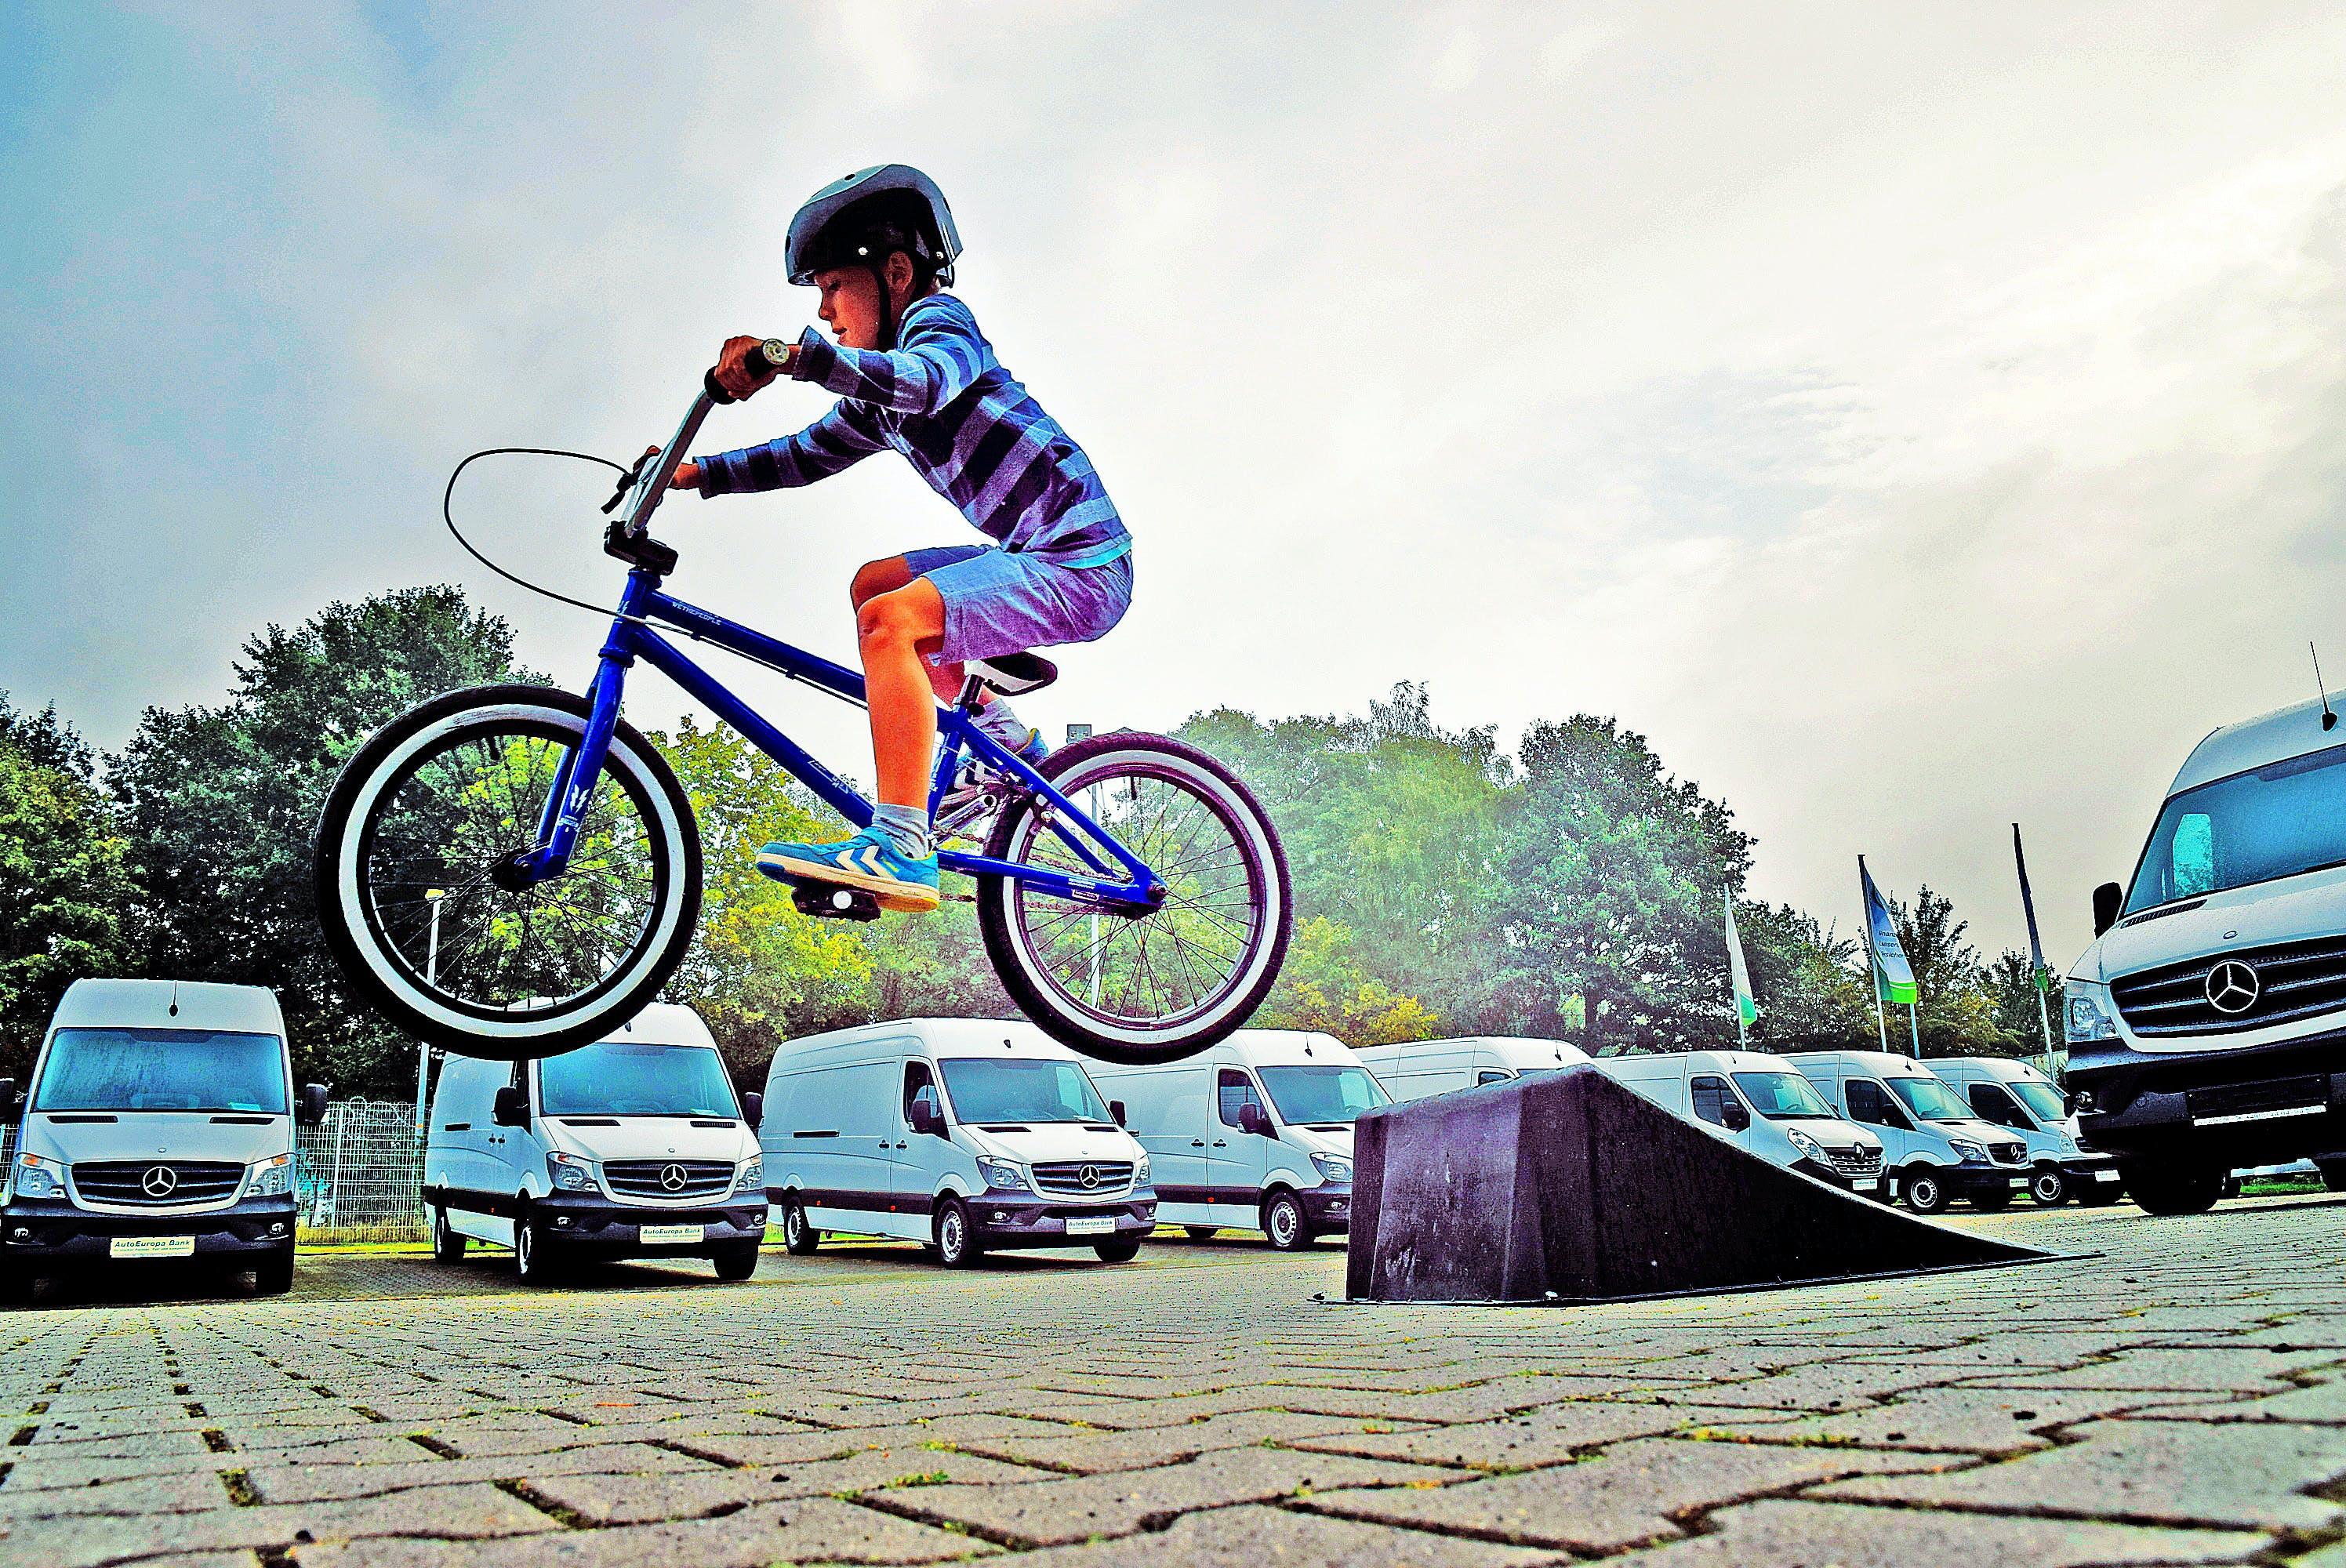 Boy in Black Nutshell Helmet on Blue Bmx Bike Having Hangtime After Taking Off on Ramp